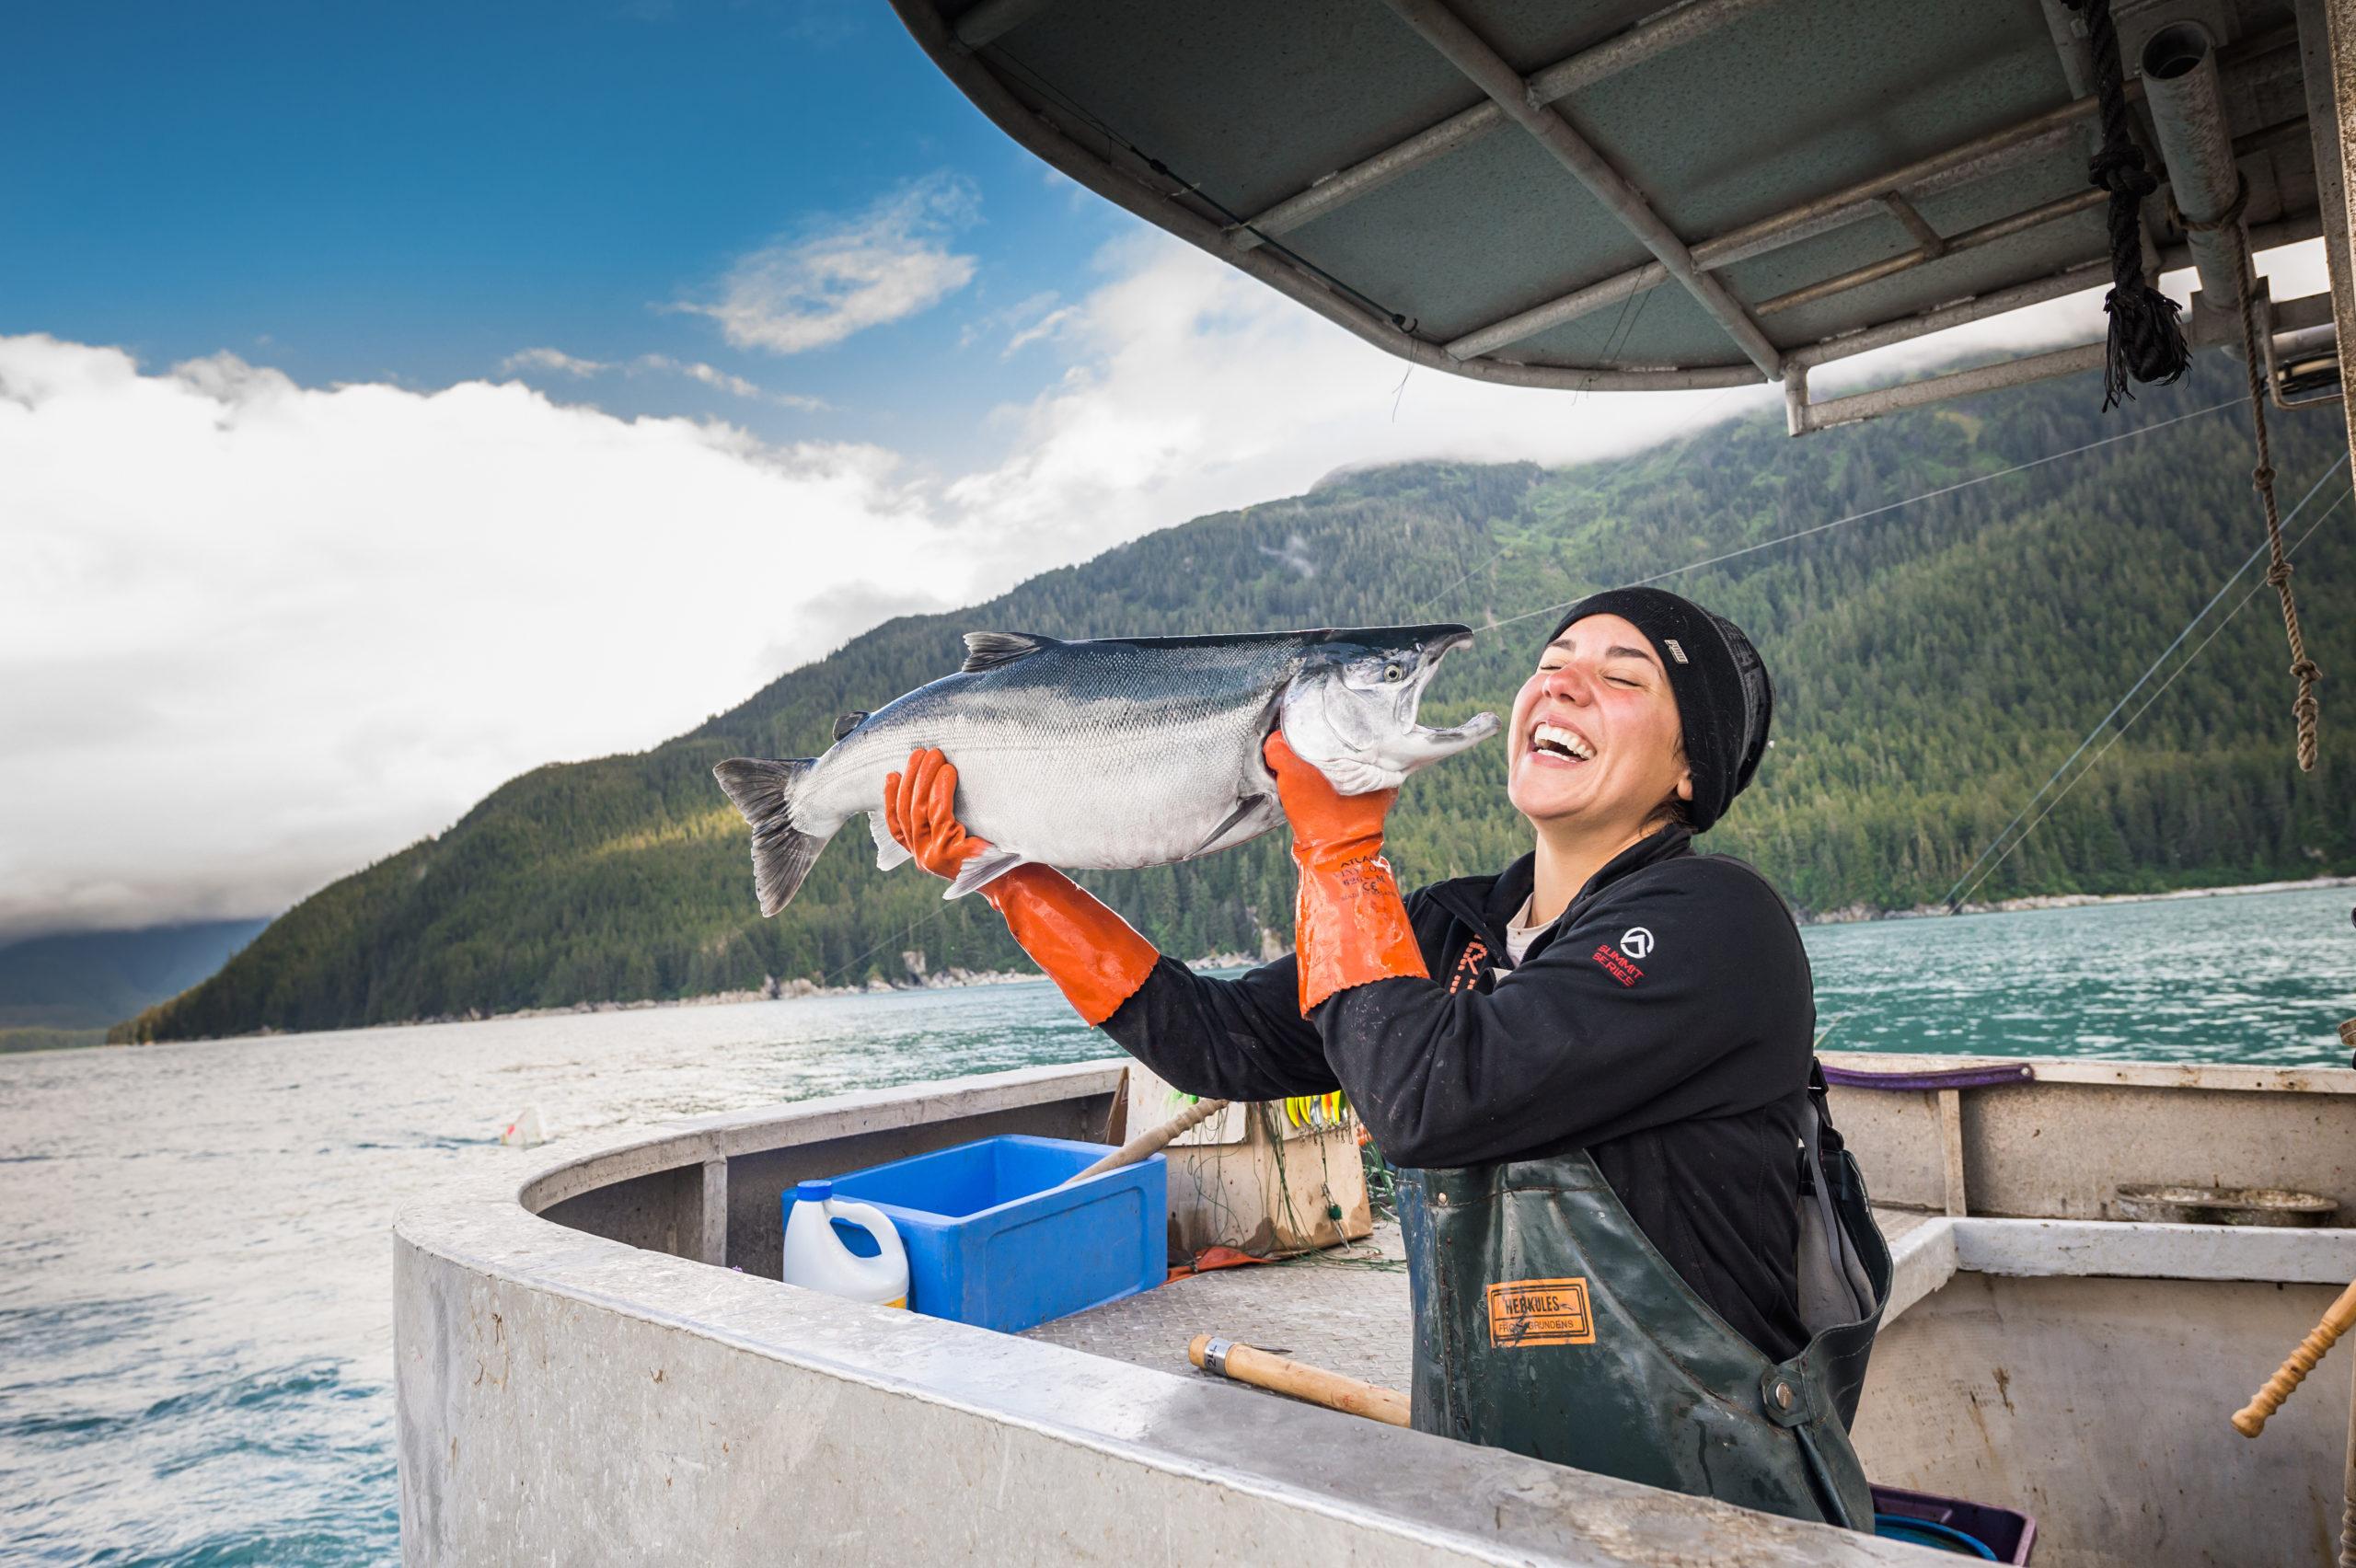 Gegrillter Kabeljau aus nachhaltigem Fang